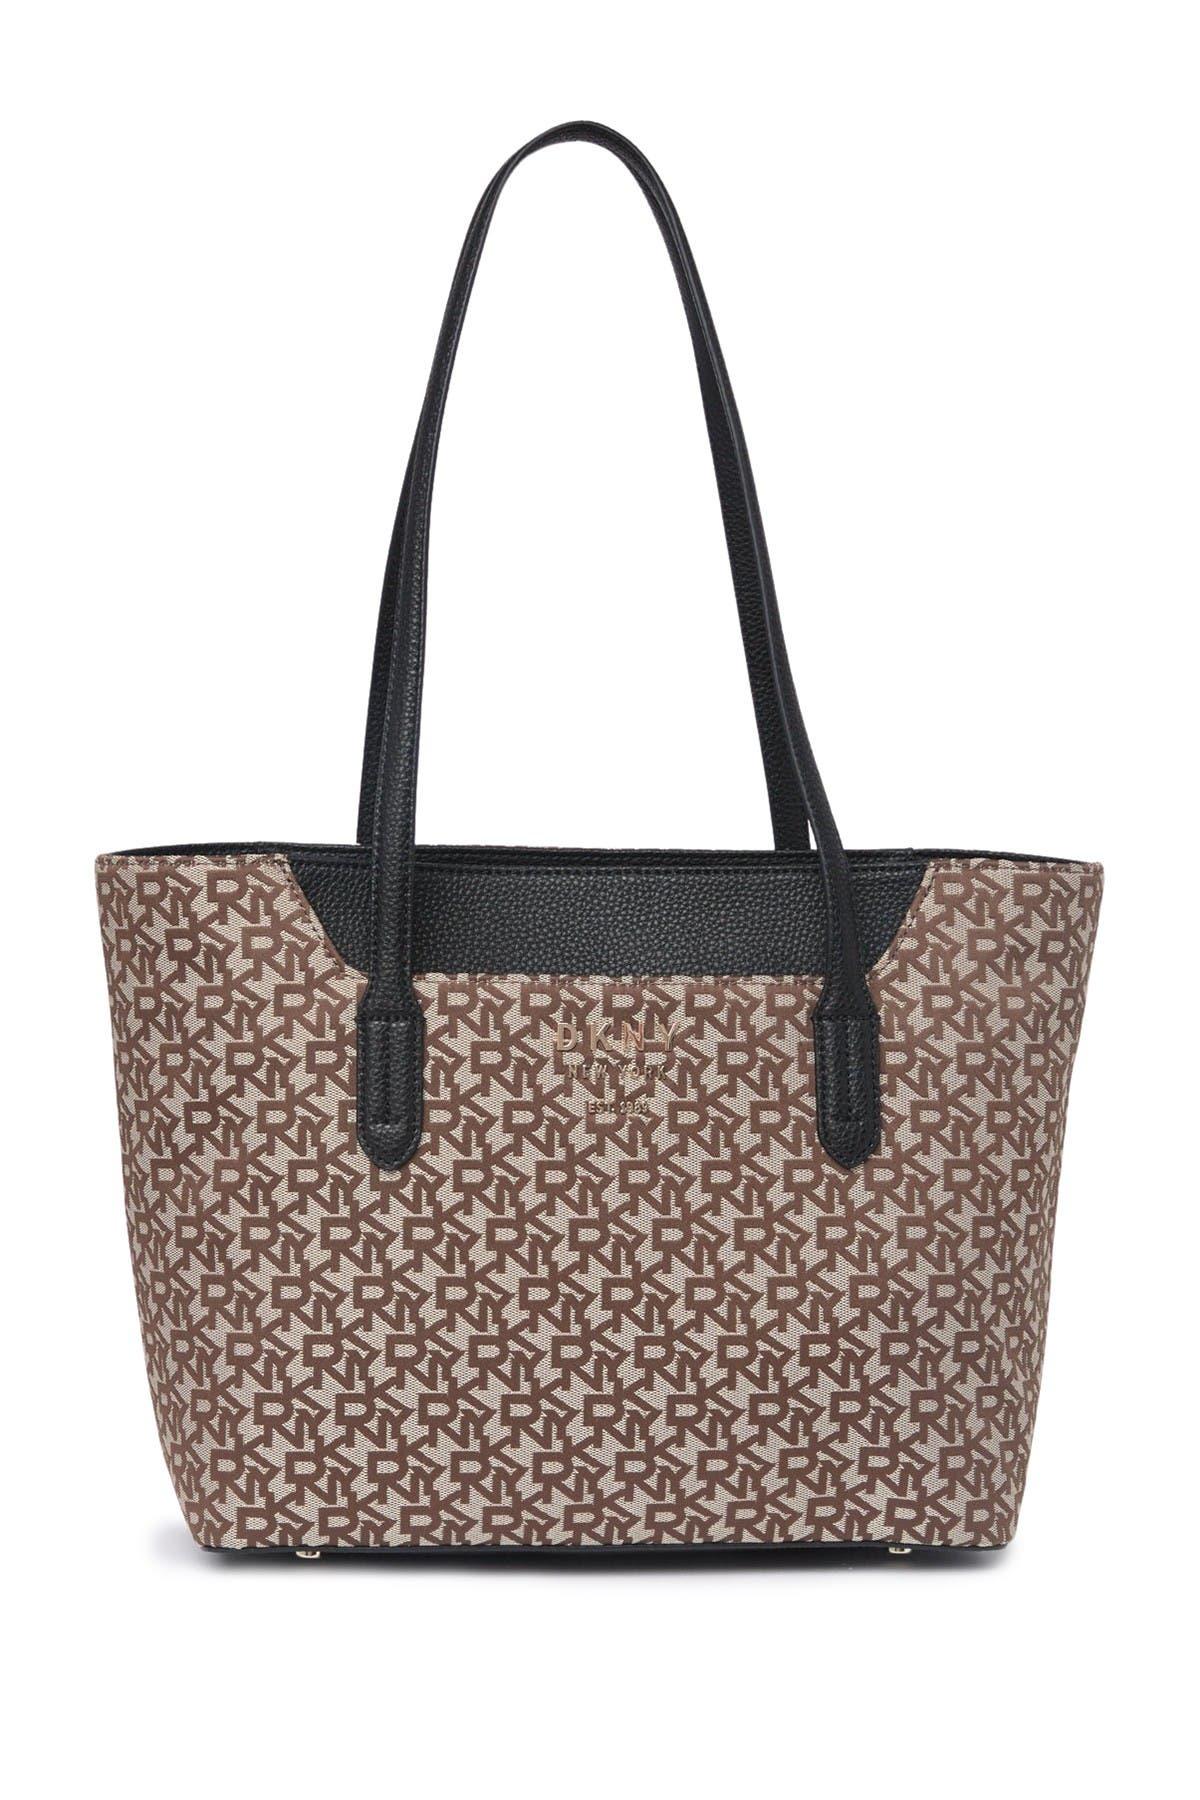 Image of DKNY Noho Logo Print Tote Bag